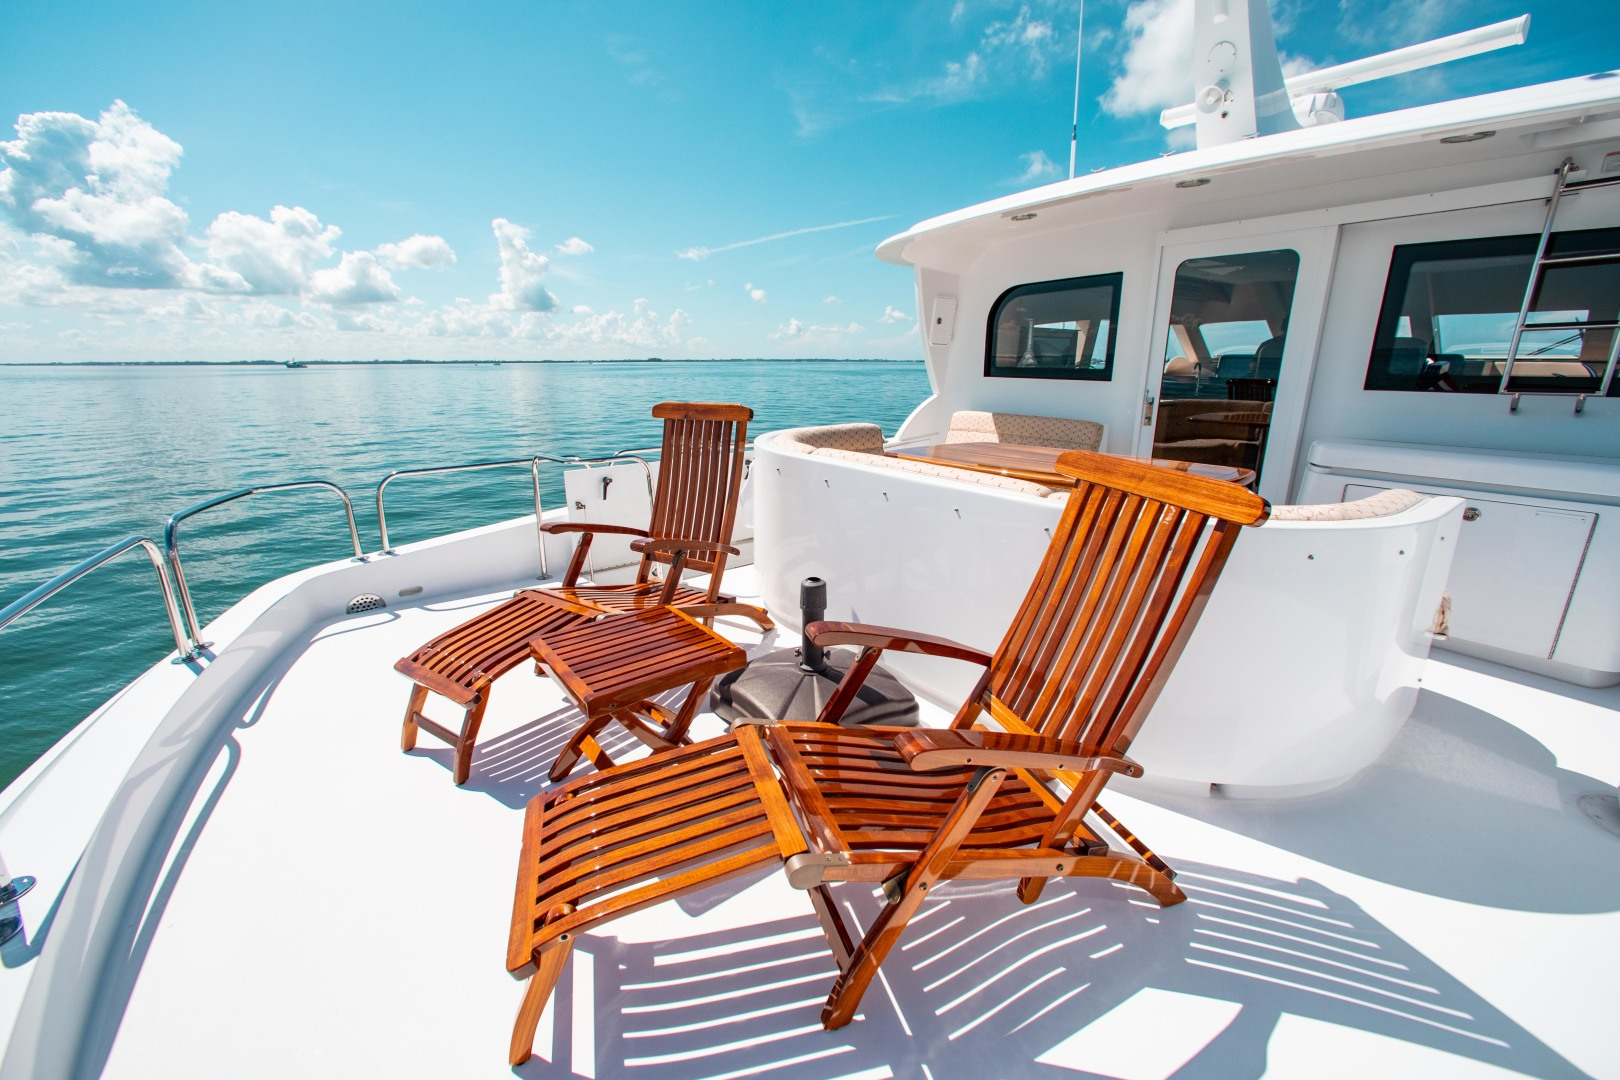 Hatteras-80 Motor Yacht 2008-Galati Yacht Sales Trade Anna Maria-Florida-United States-2008 Hatteras 80 Motor Yacht  Galati Yacht Sales Trade  Skylounge Aft Deck-1466258 | Thumbnail